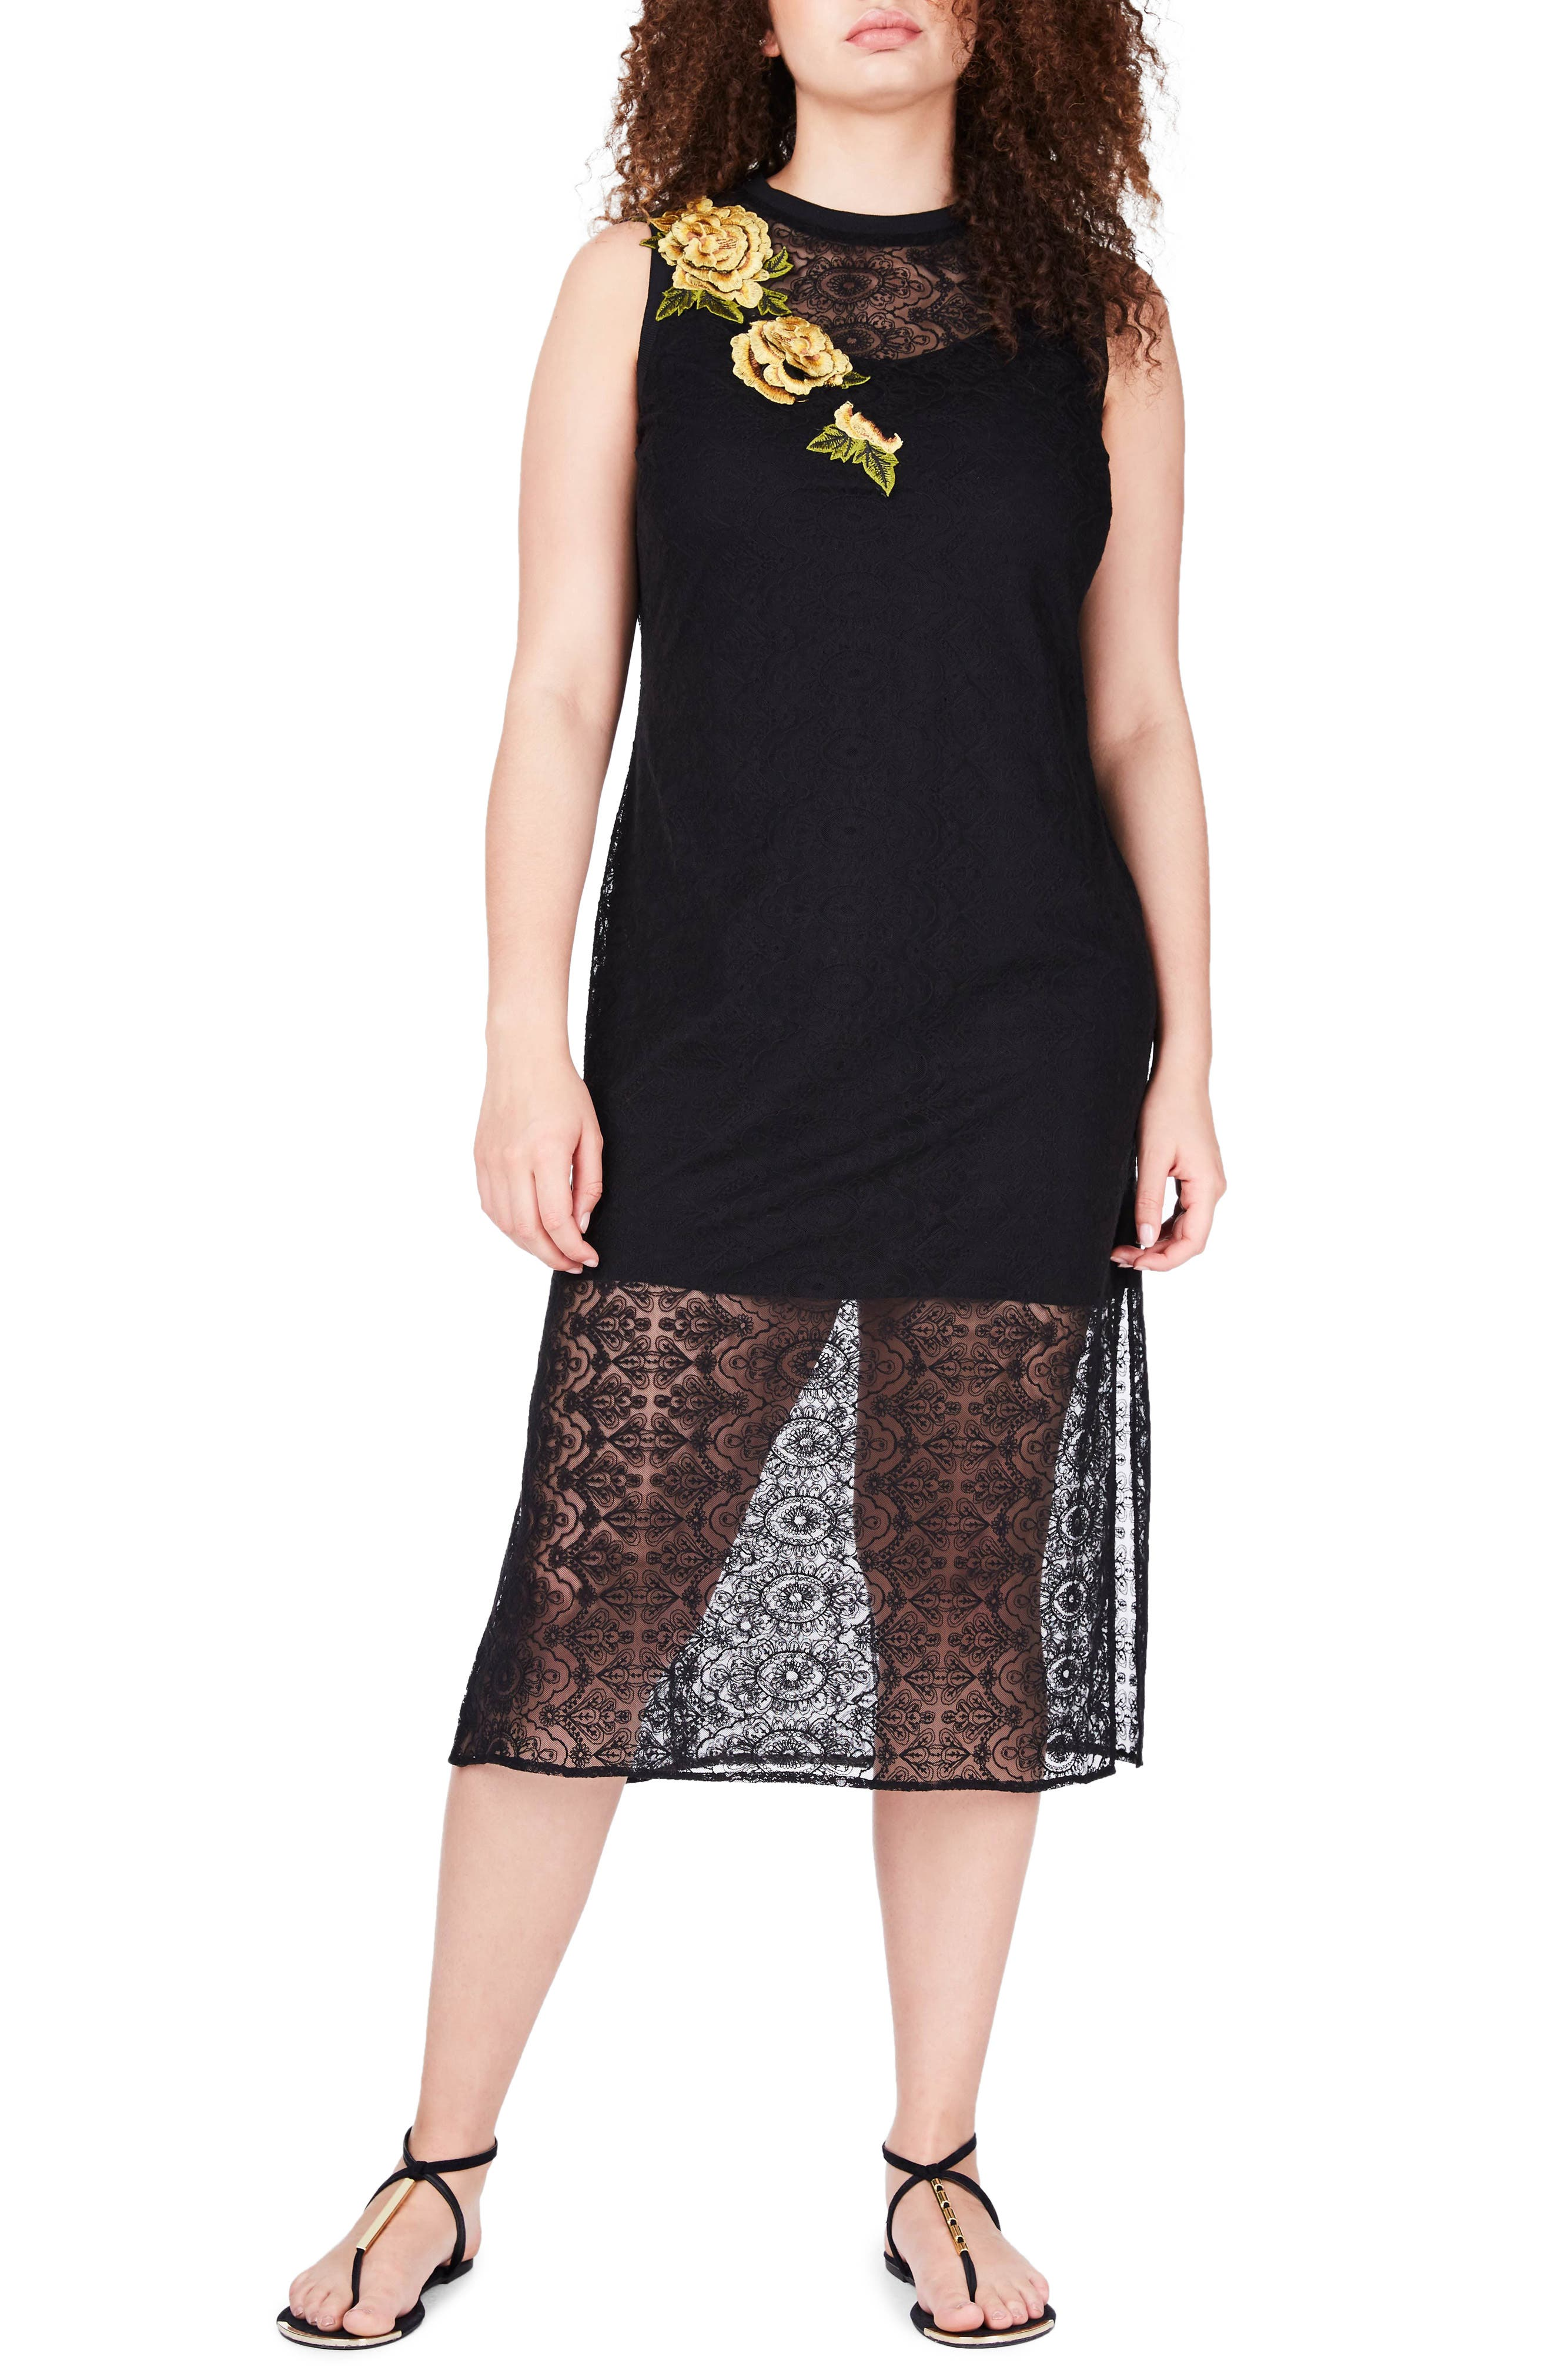 Main Image - ELVI Embroidered Lace Tunic Dress (Plus Size)